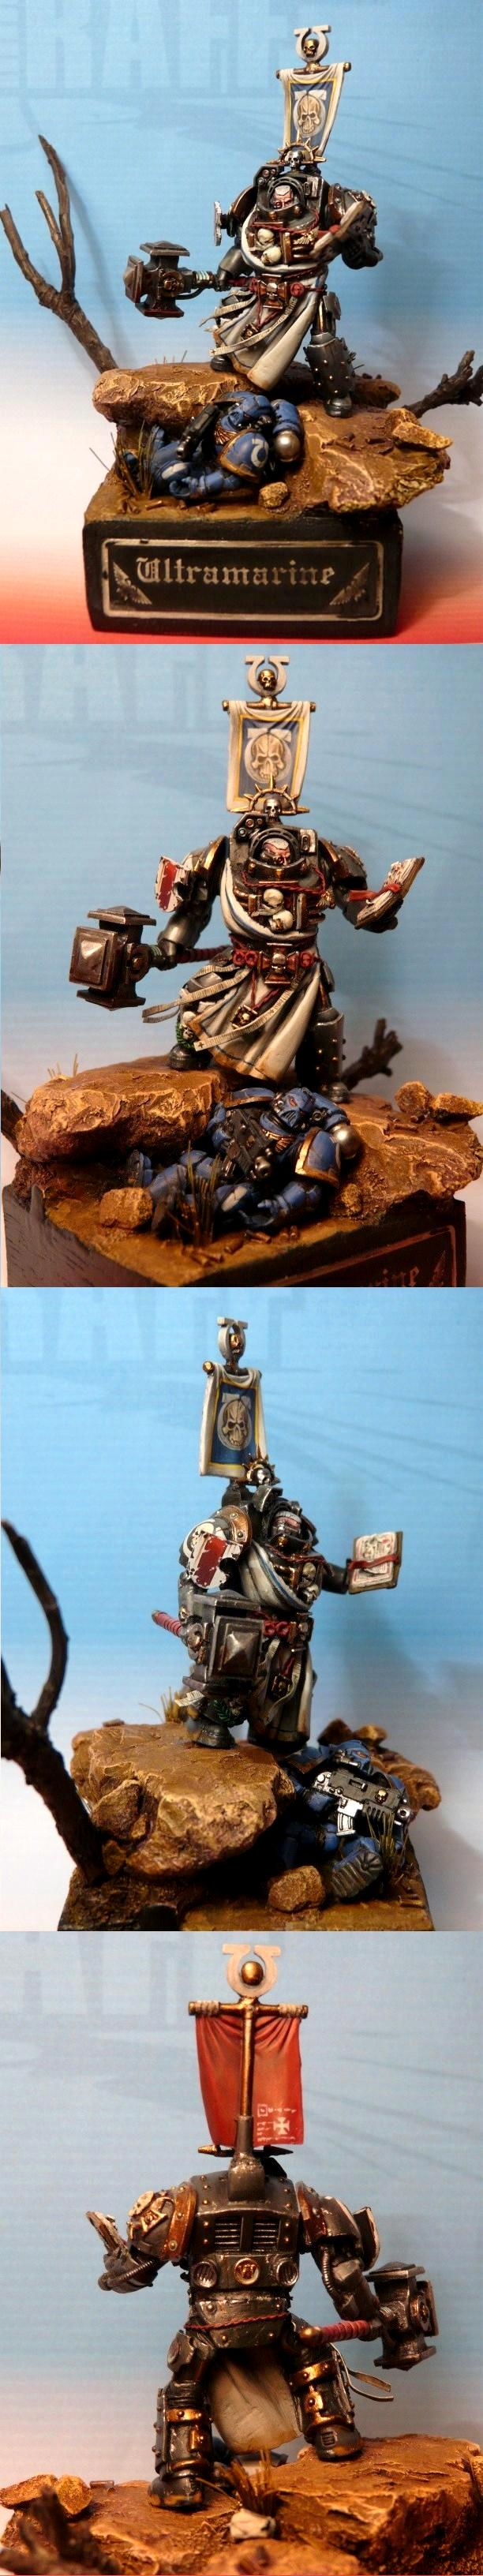 Diorama, Librarian, Space Marines, Terminator Armor, True Scale, Ultramarines